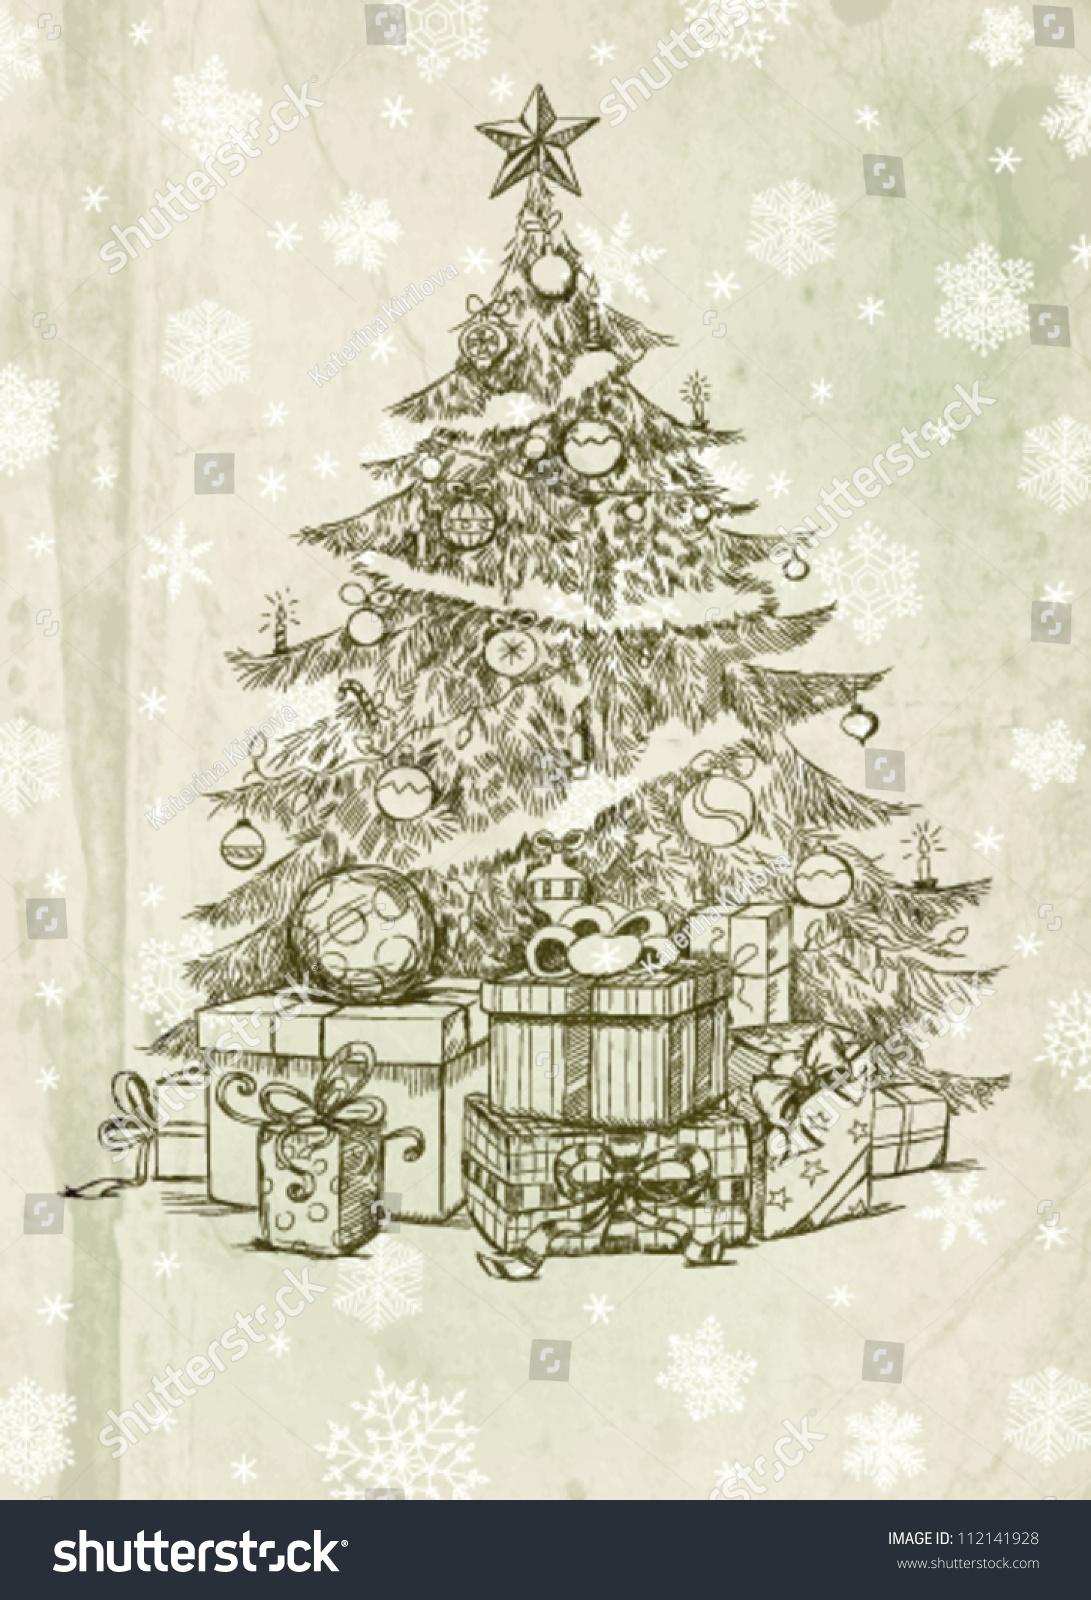 Realistic christmas tree drawing - Hand Drawn Christmas Tree And Gifts